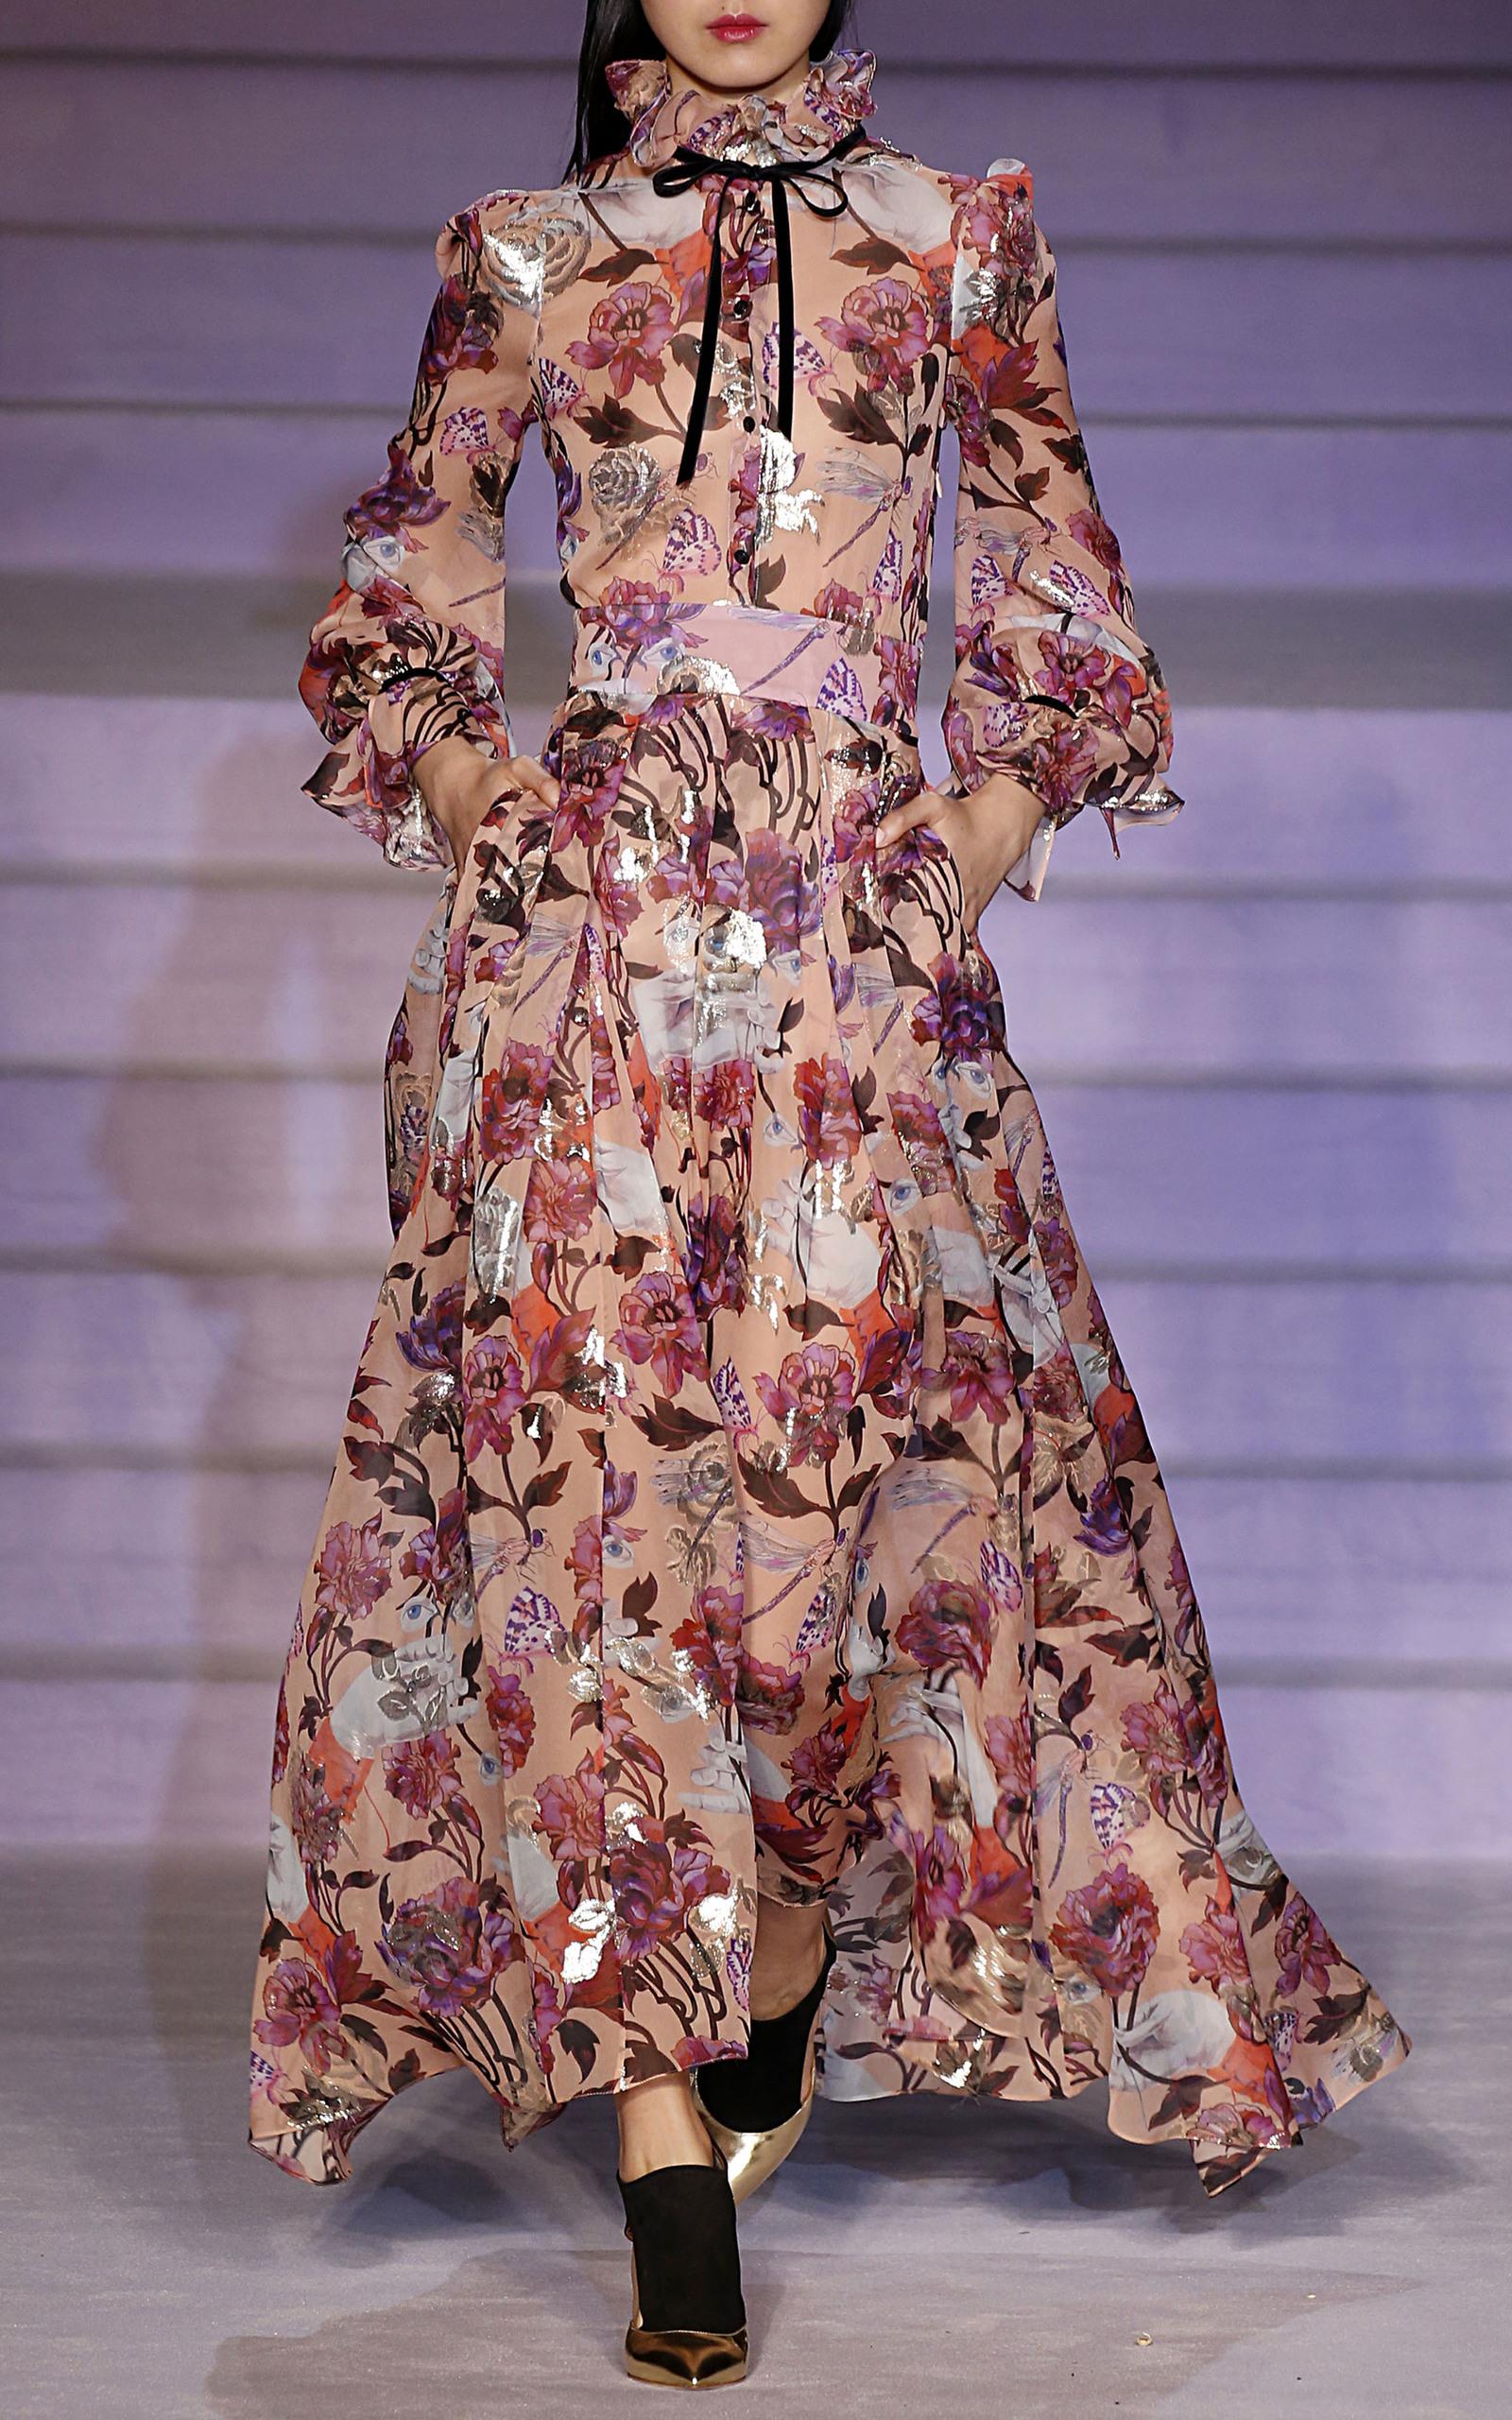 Magritte the Evening Dress